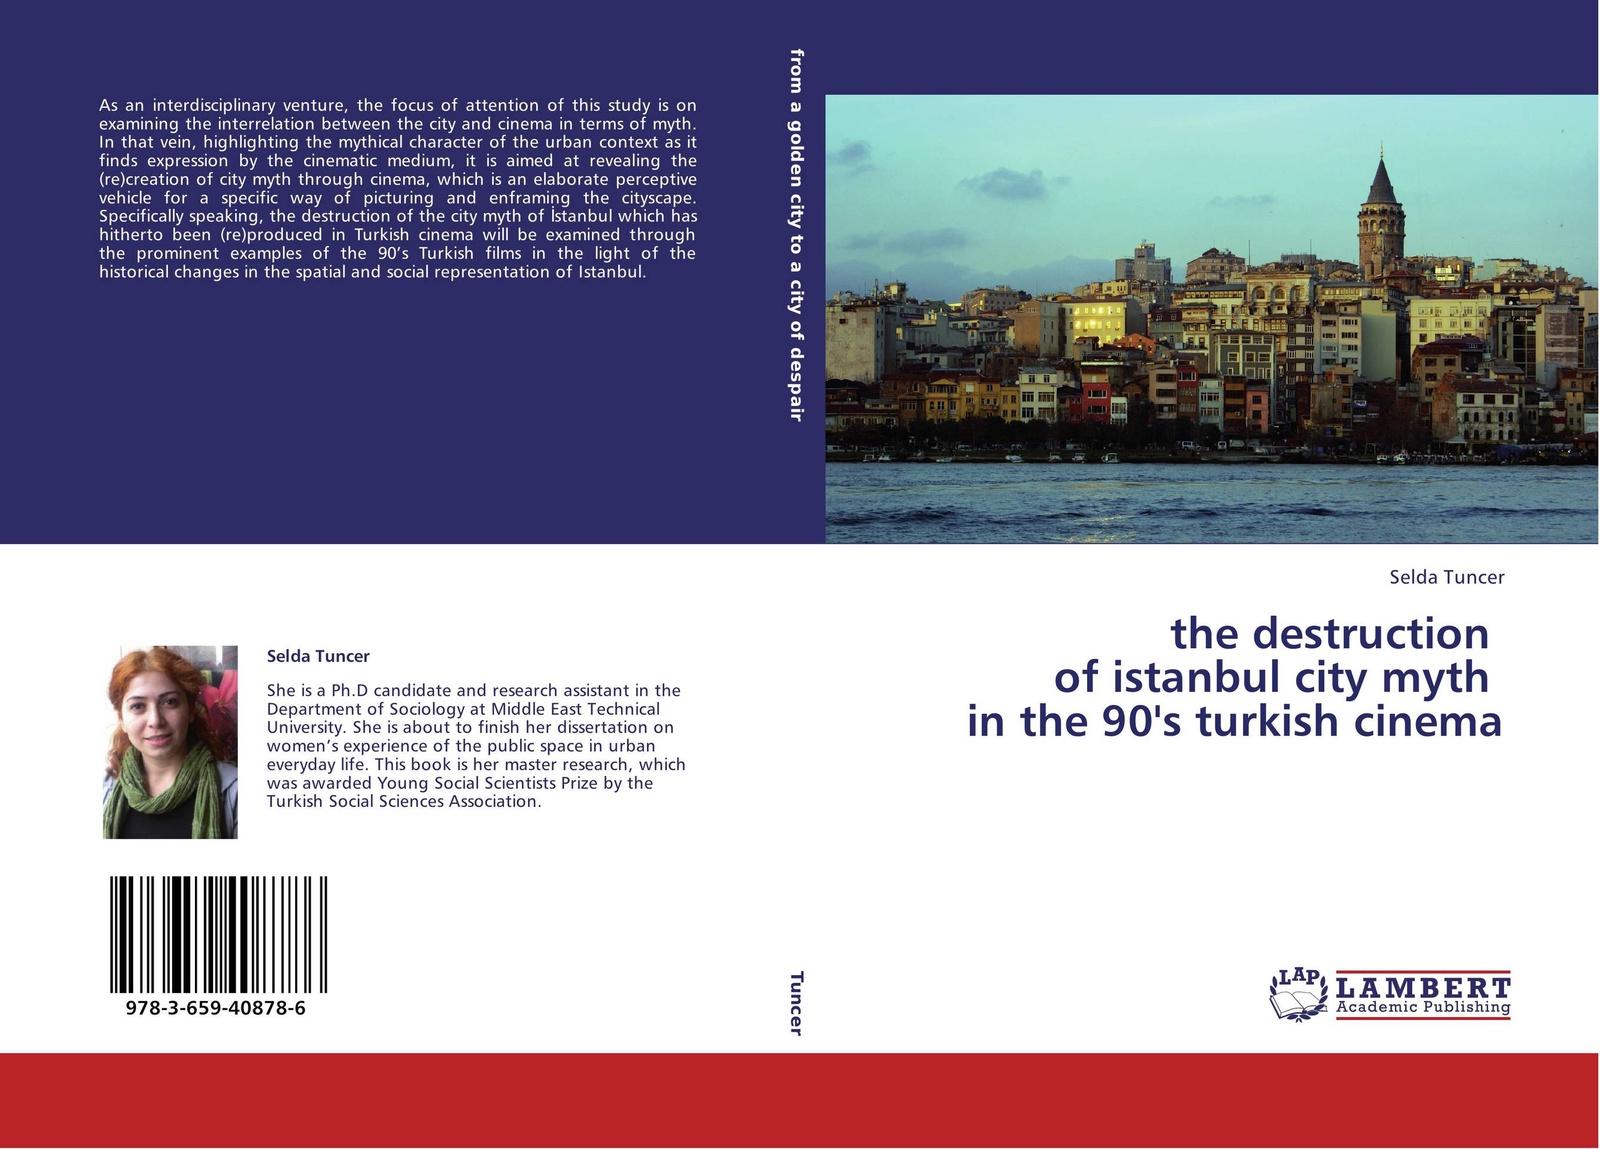 Selda Tuncer the destruction of istanbul city myth in the 90's turkish cinema the anatomy of myth